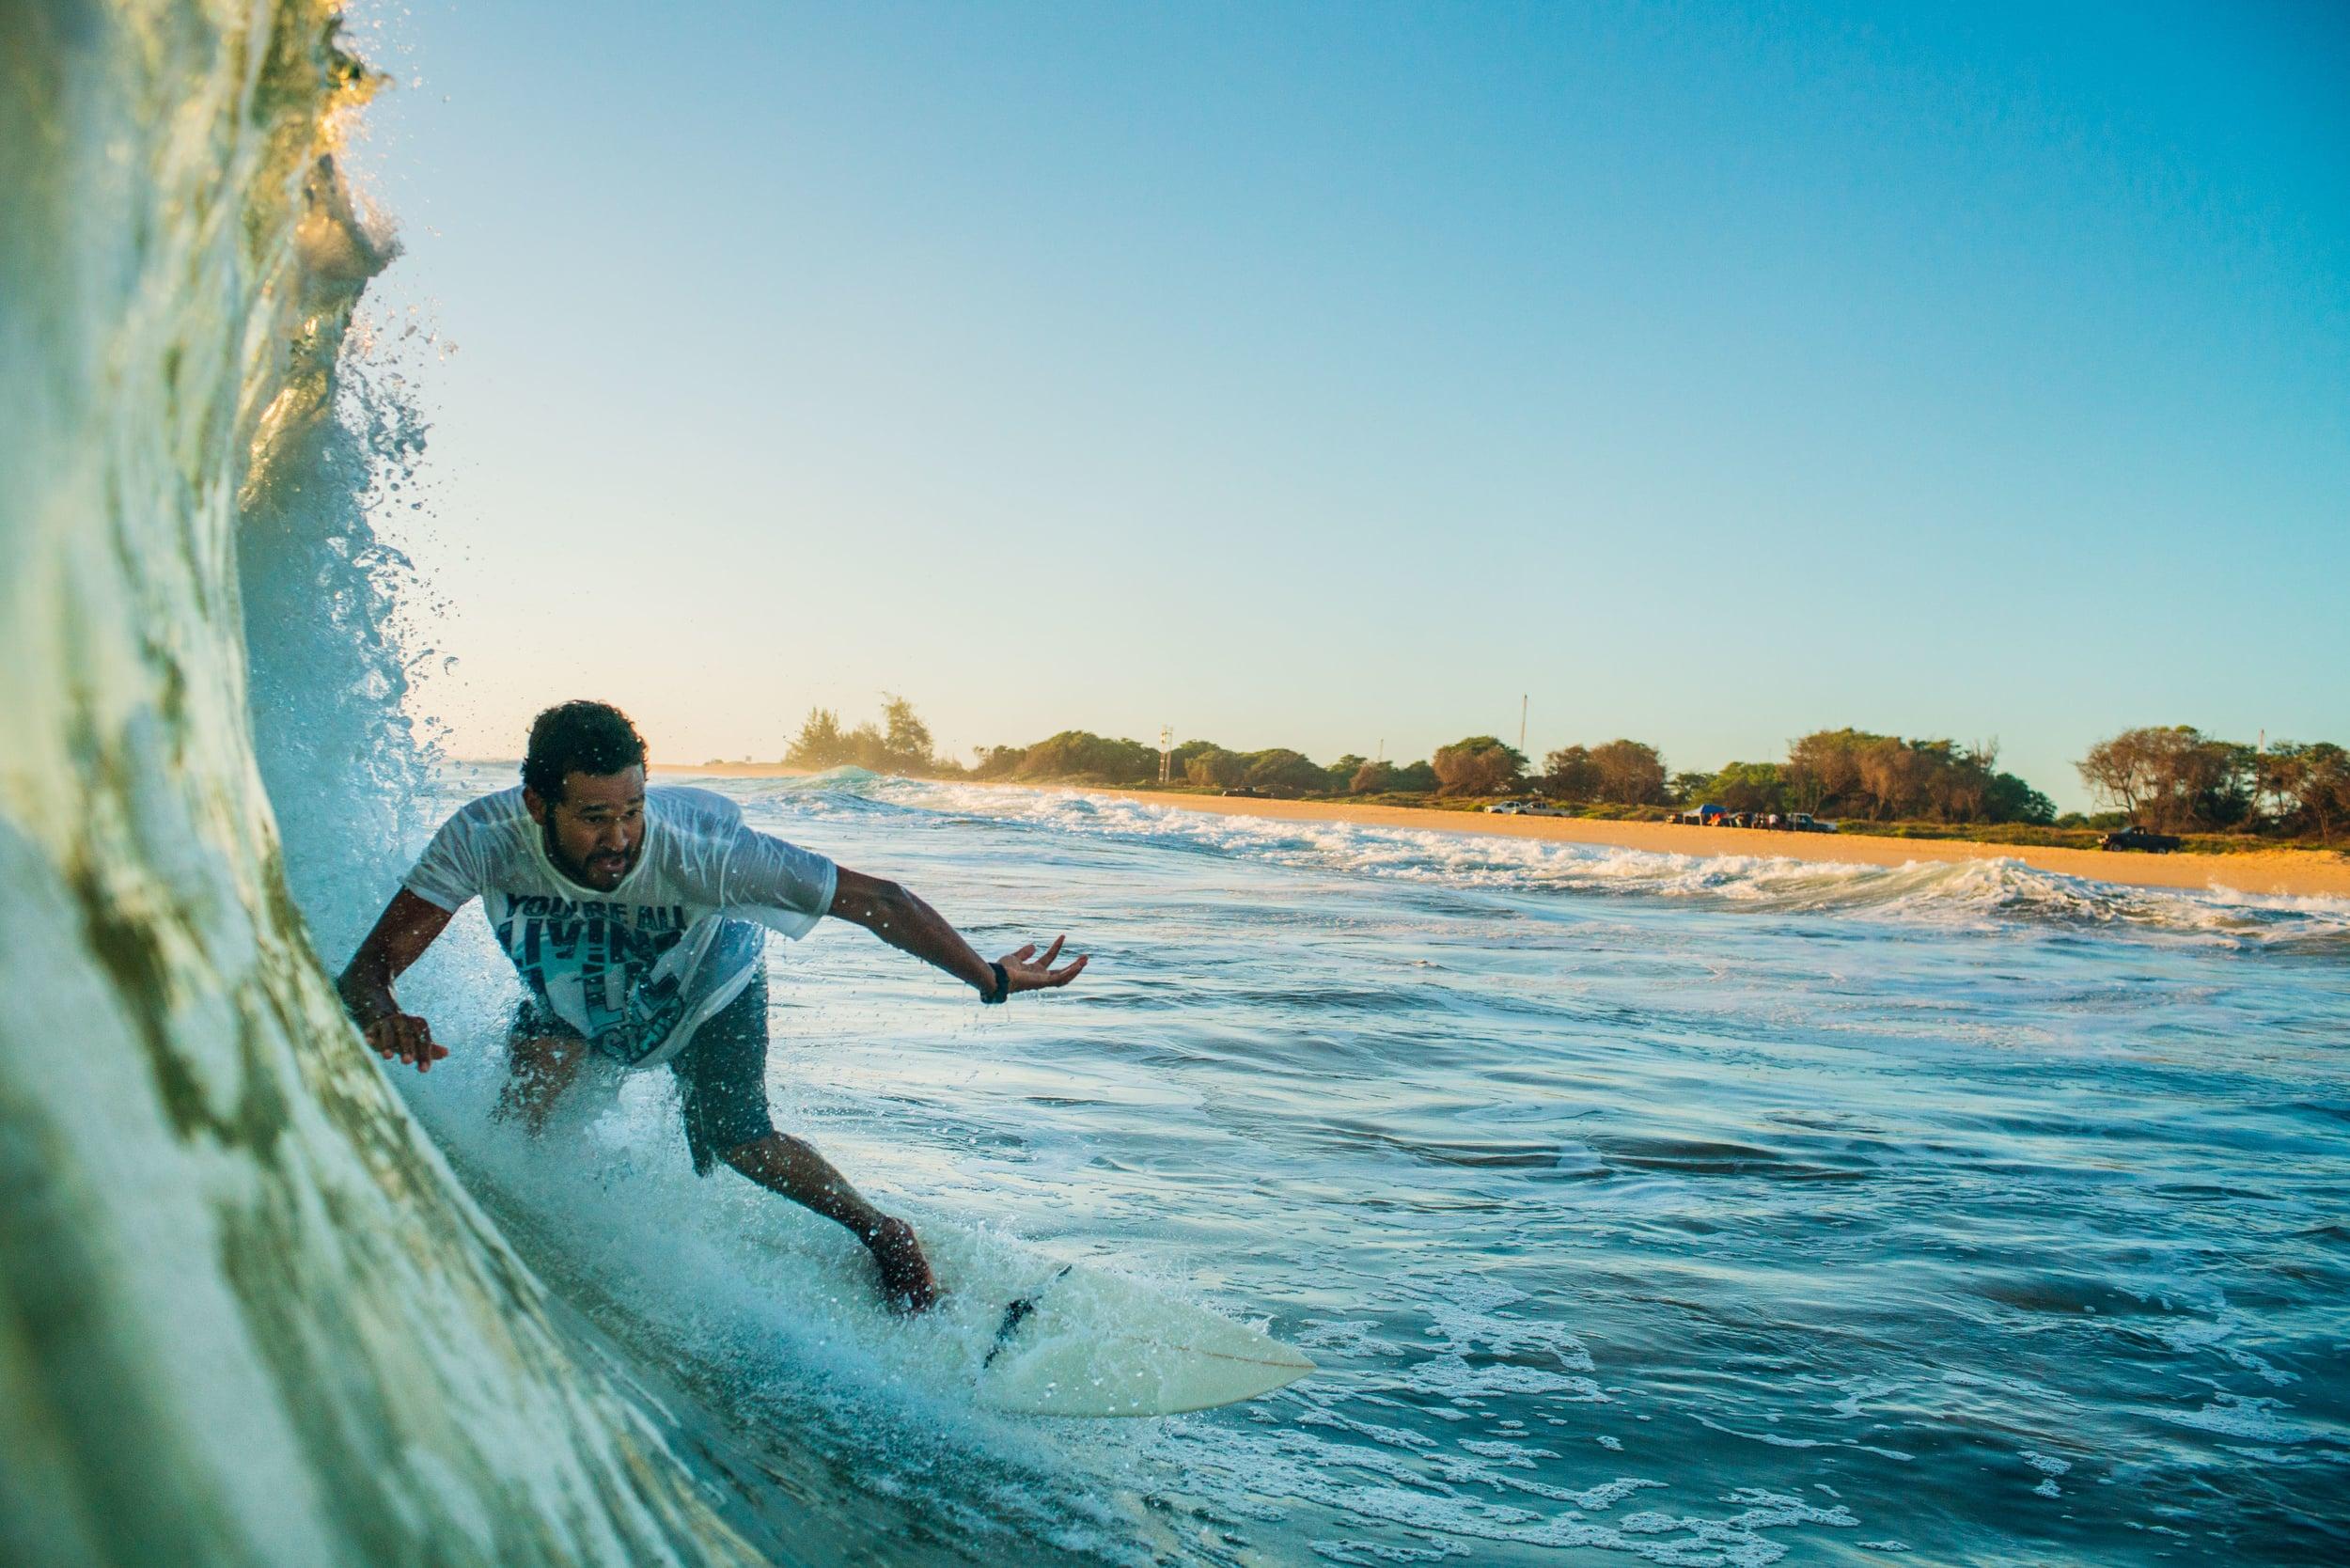 bryce-johnson-photography-kauai-hawaii-surfing-a7rii-aquatech-water-ocean-5.jpg